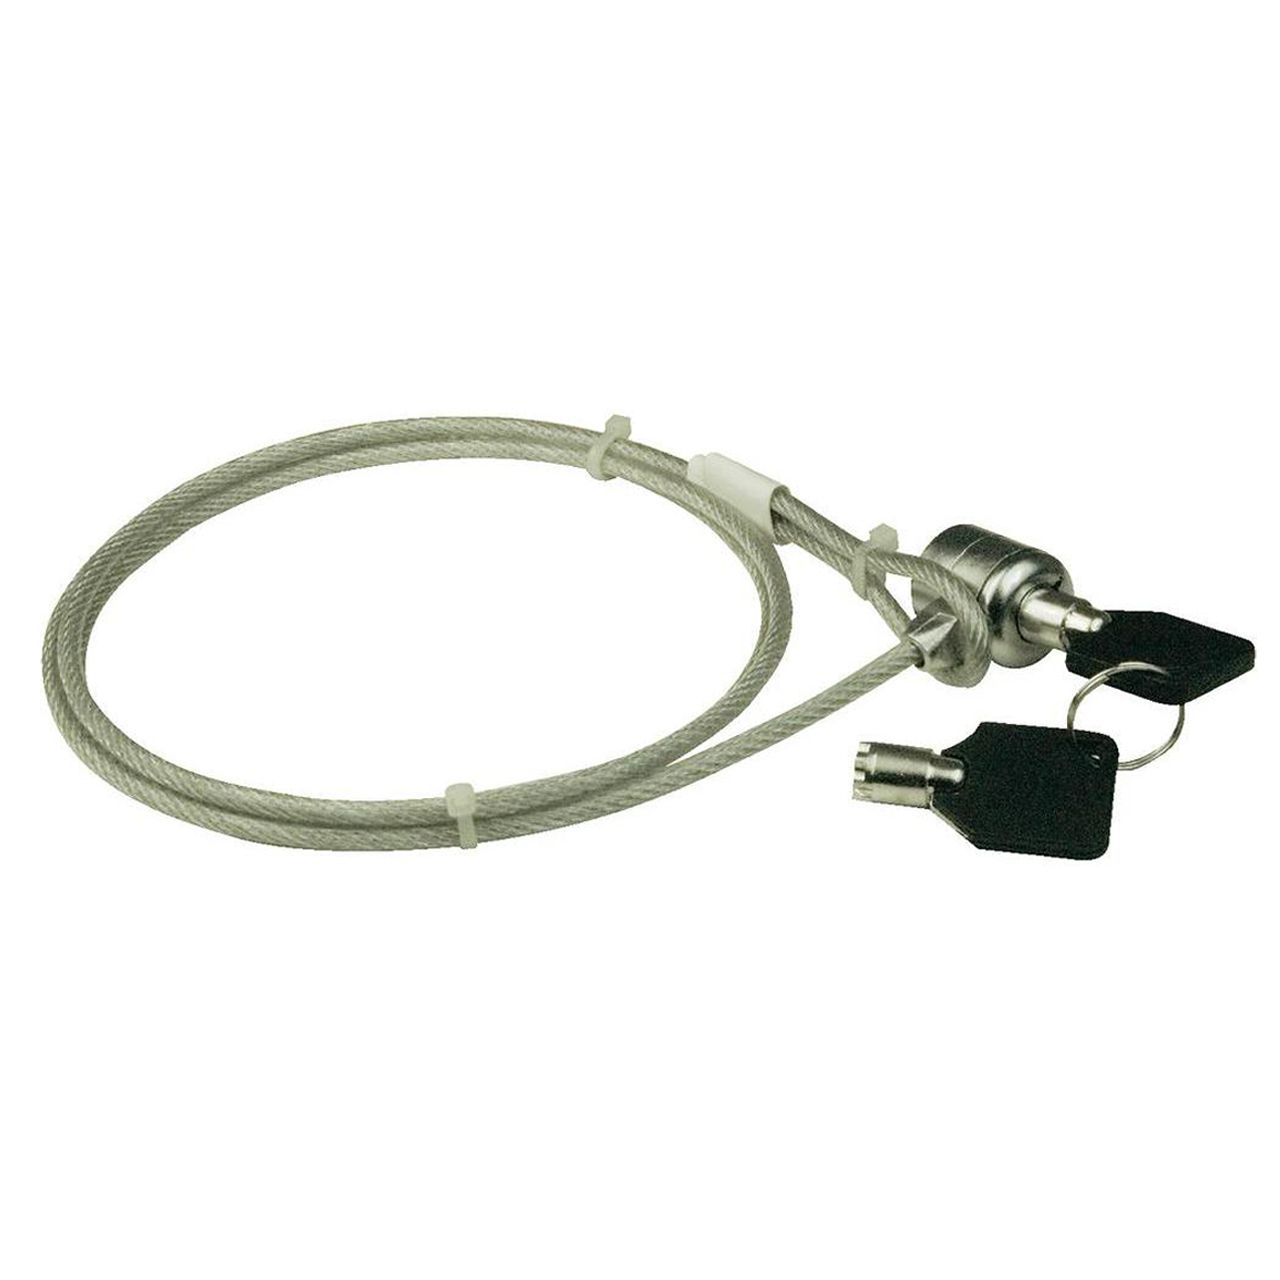 Antidiefstal kabel voor flatscreenarm